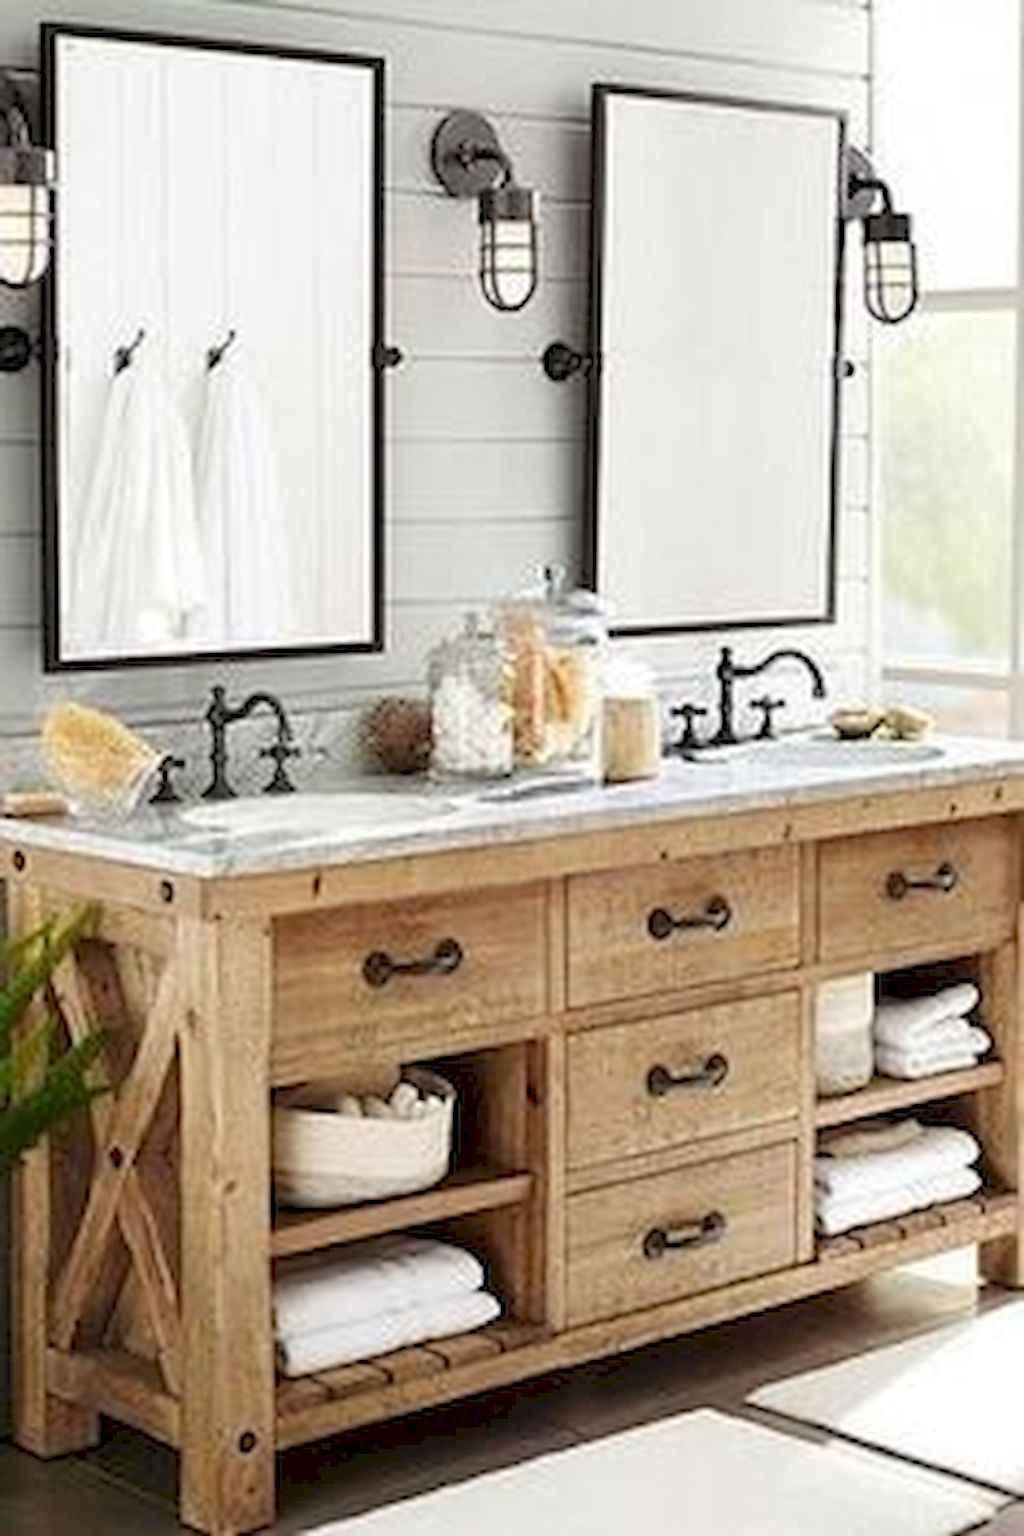 Inspiring rustic bathroom decor ideas (11)